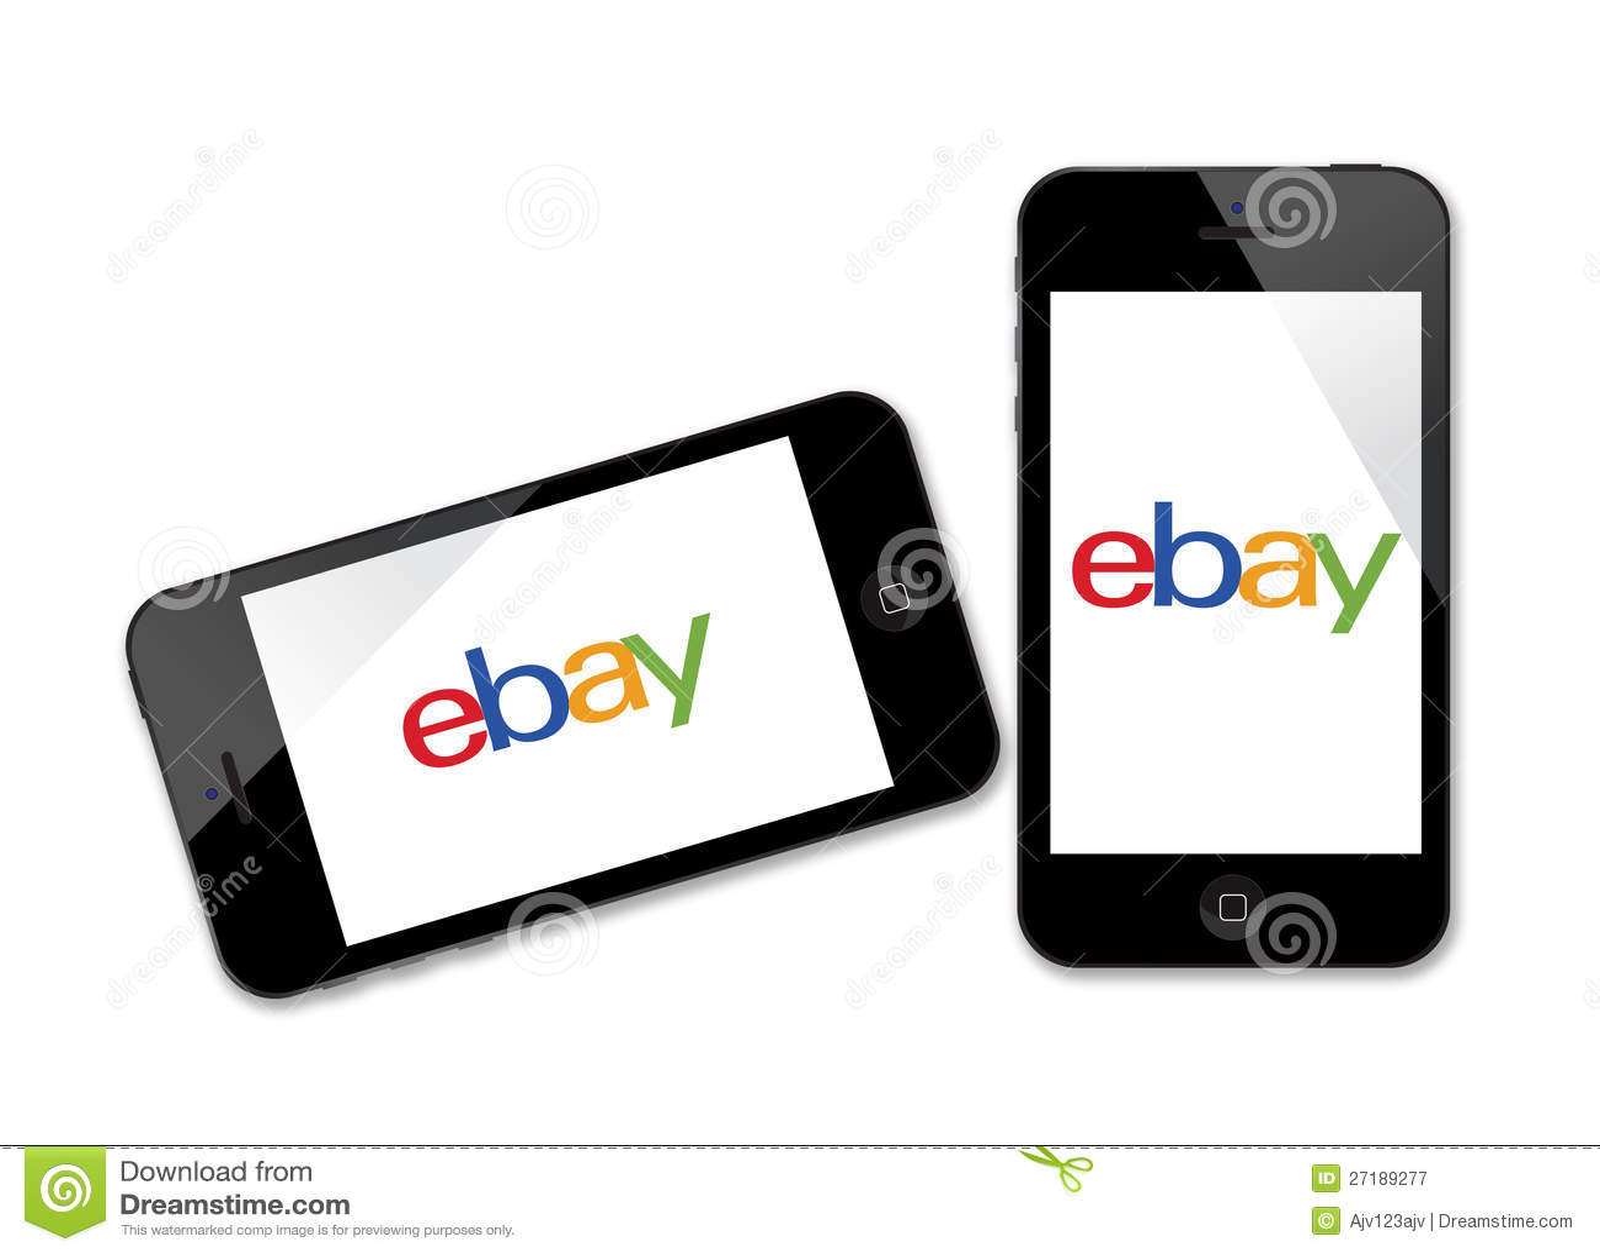 Ebay Logo On IPhone Editorial Photography - Image: 27189277